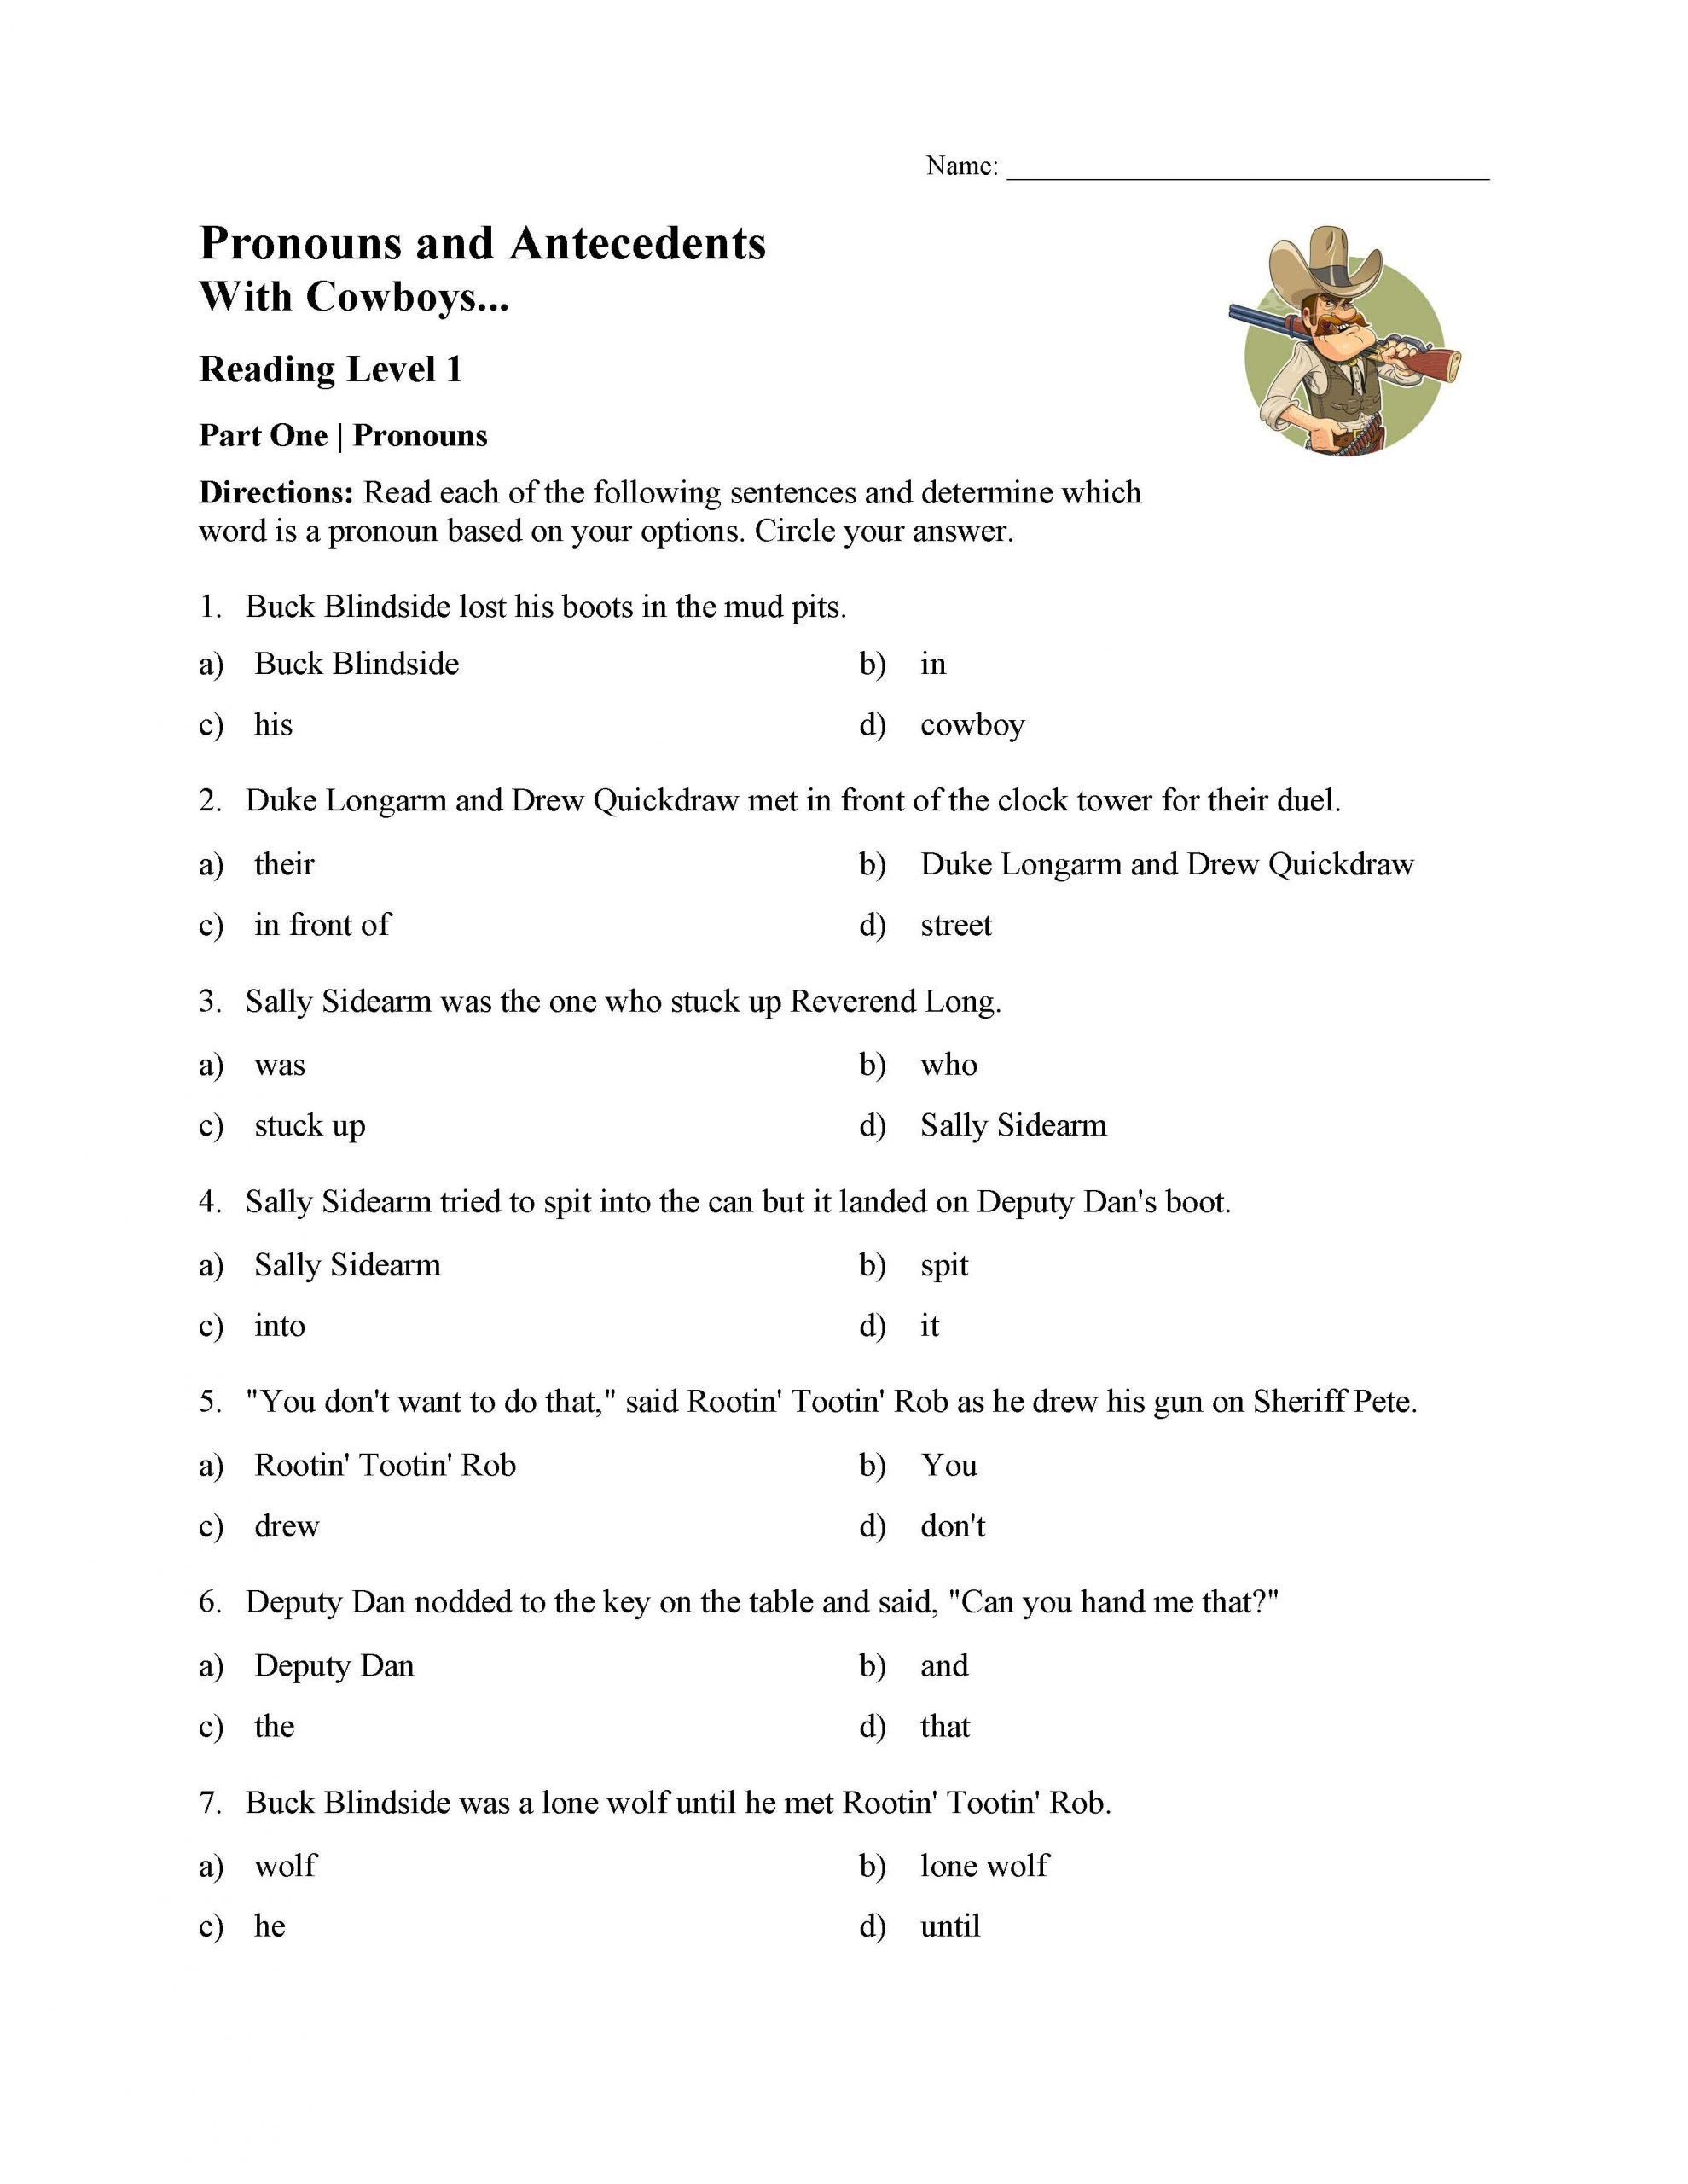 Pronoun and Antecedent Test With Cowboys